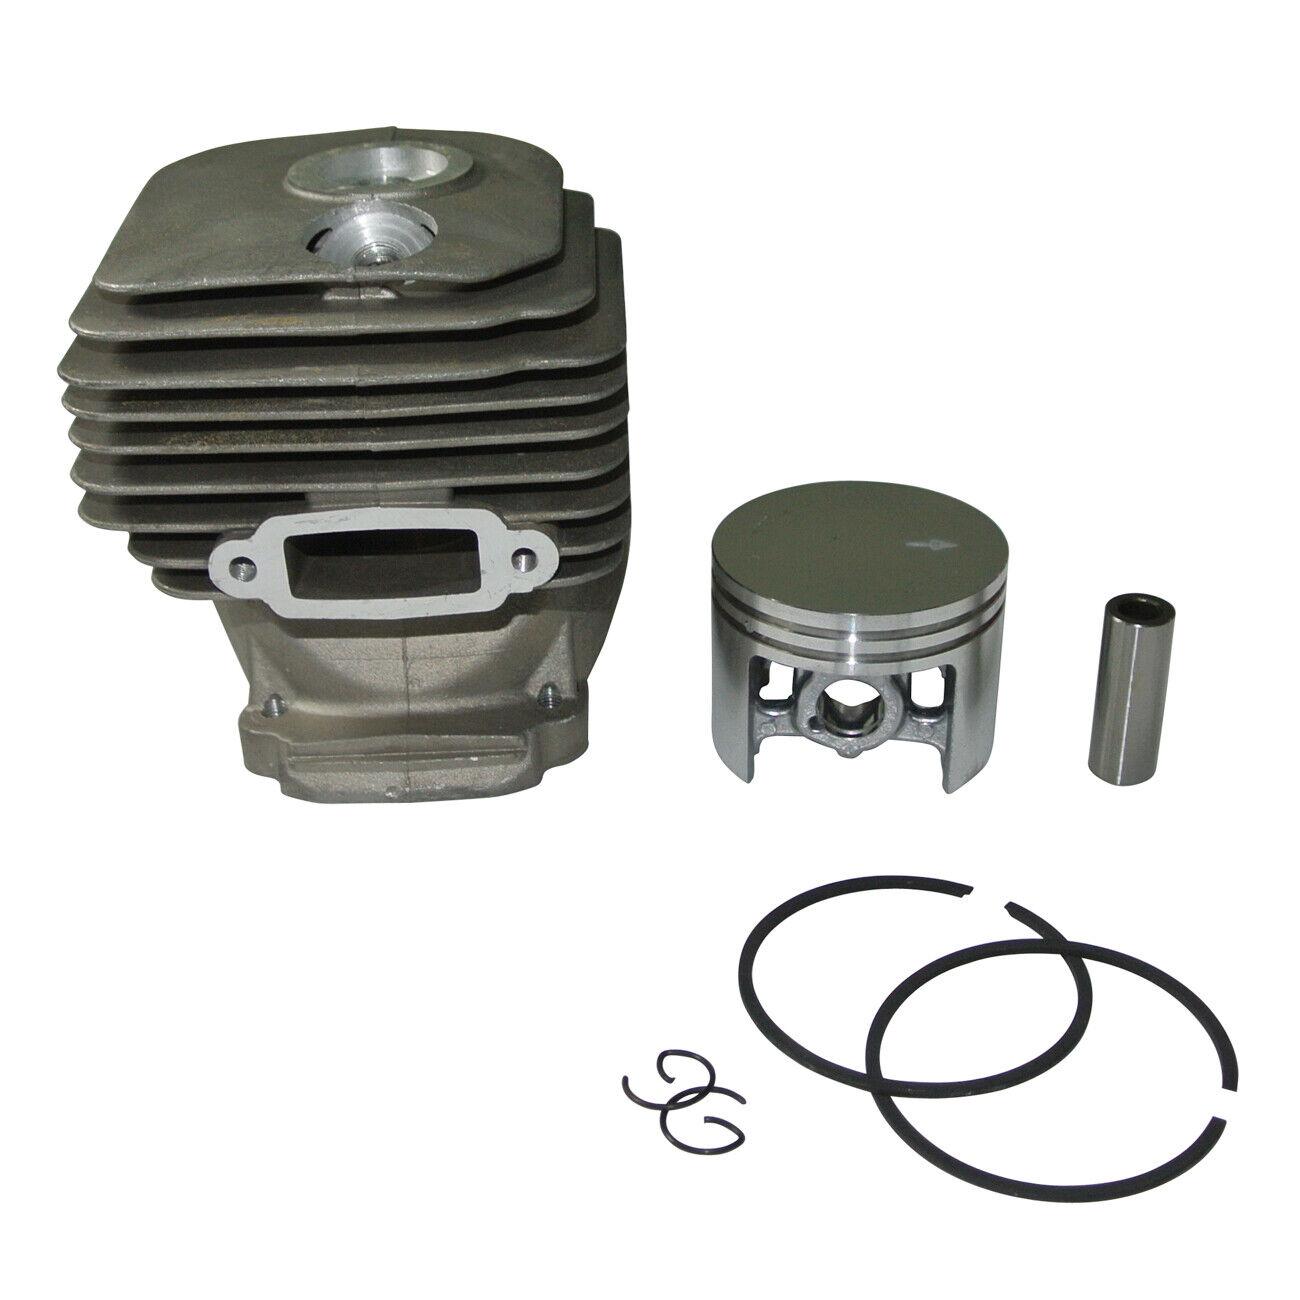 Kit de pistón del Cilindro Ajuste STIHL TS480i TS500i hormigón sierras 52mm P N 4250 020 1200